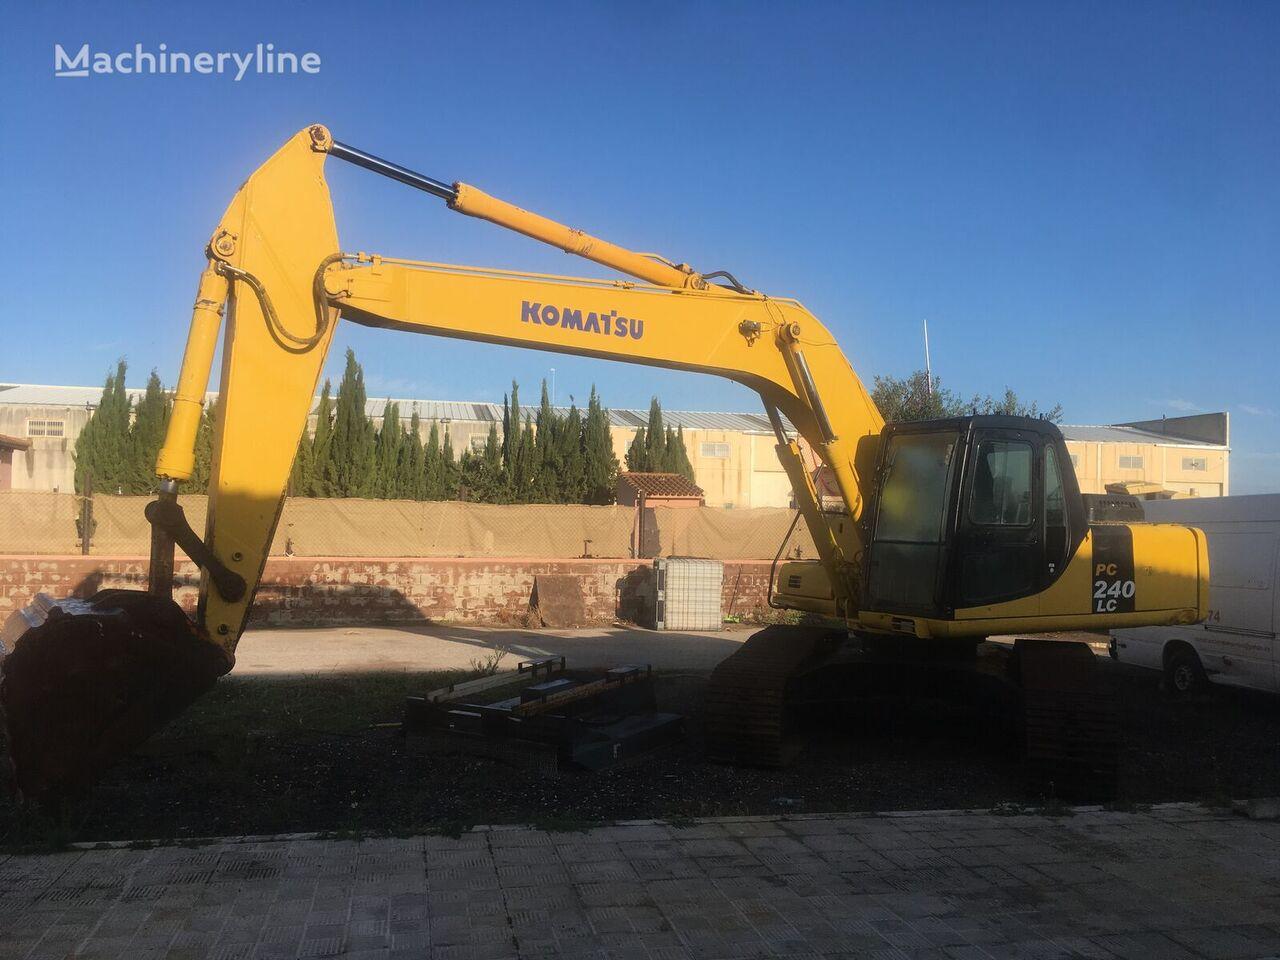 KOMATSU PC240 tracked excavator